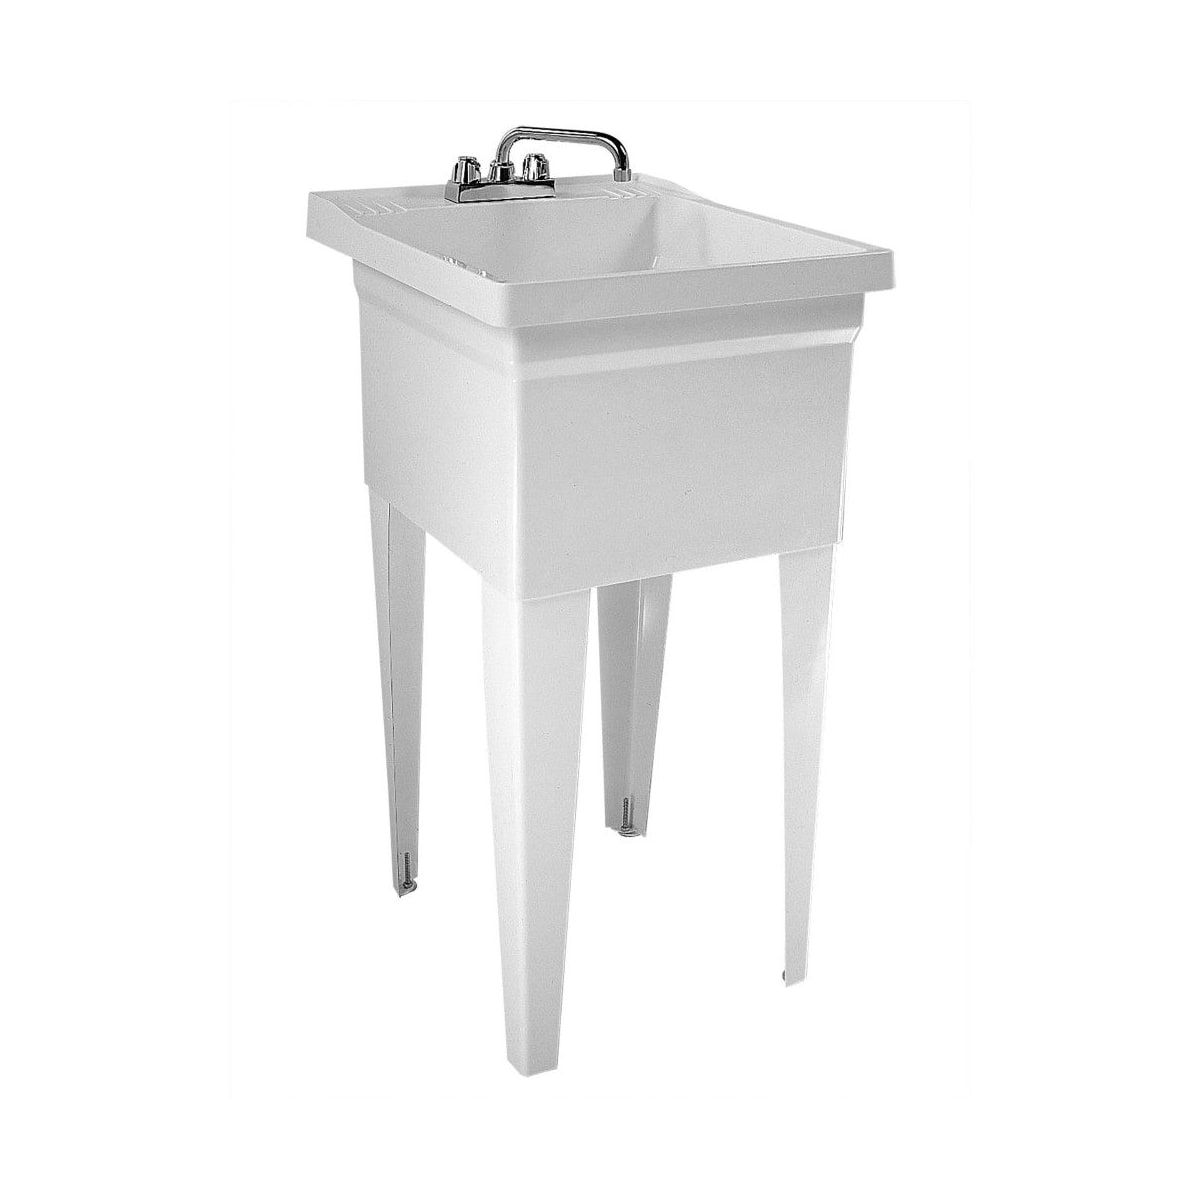 American Standard Fl7 Build Com Utility Sink American